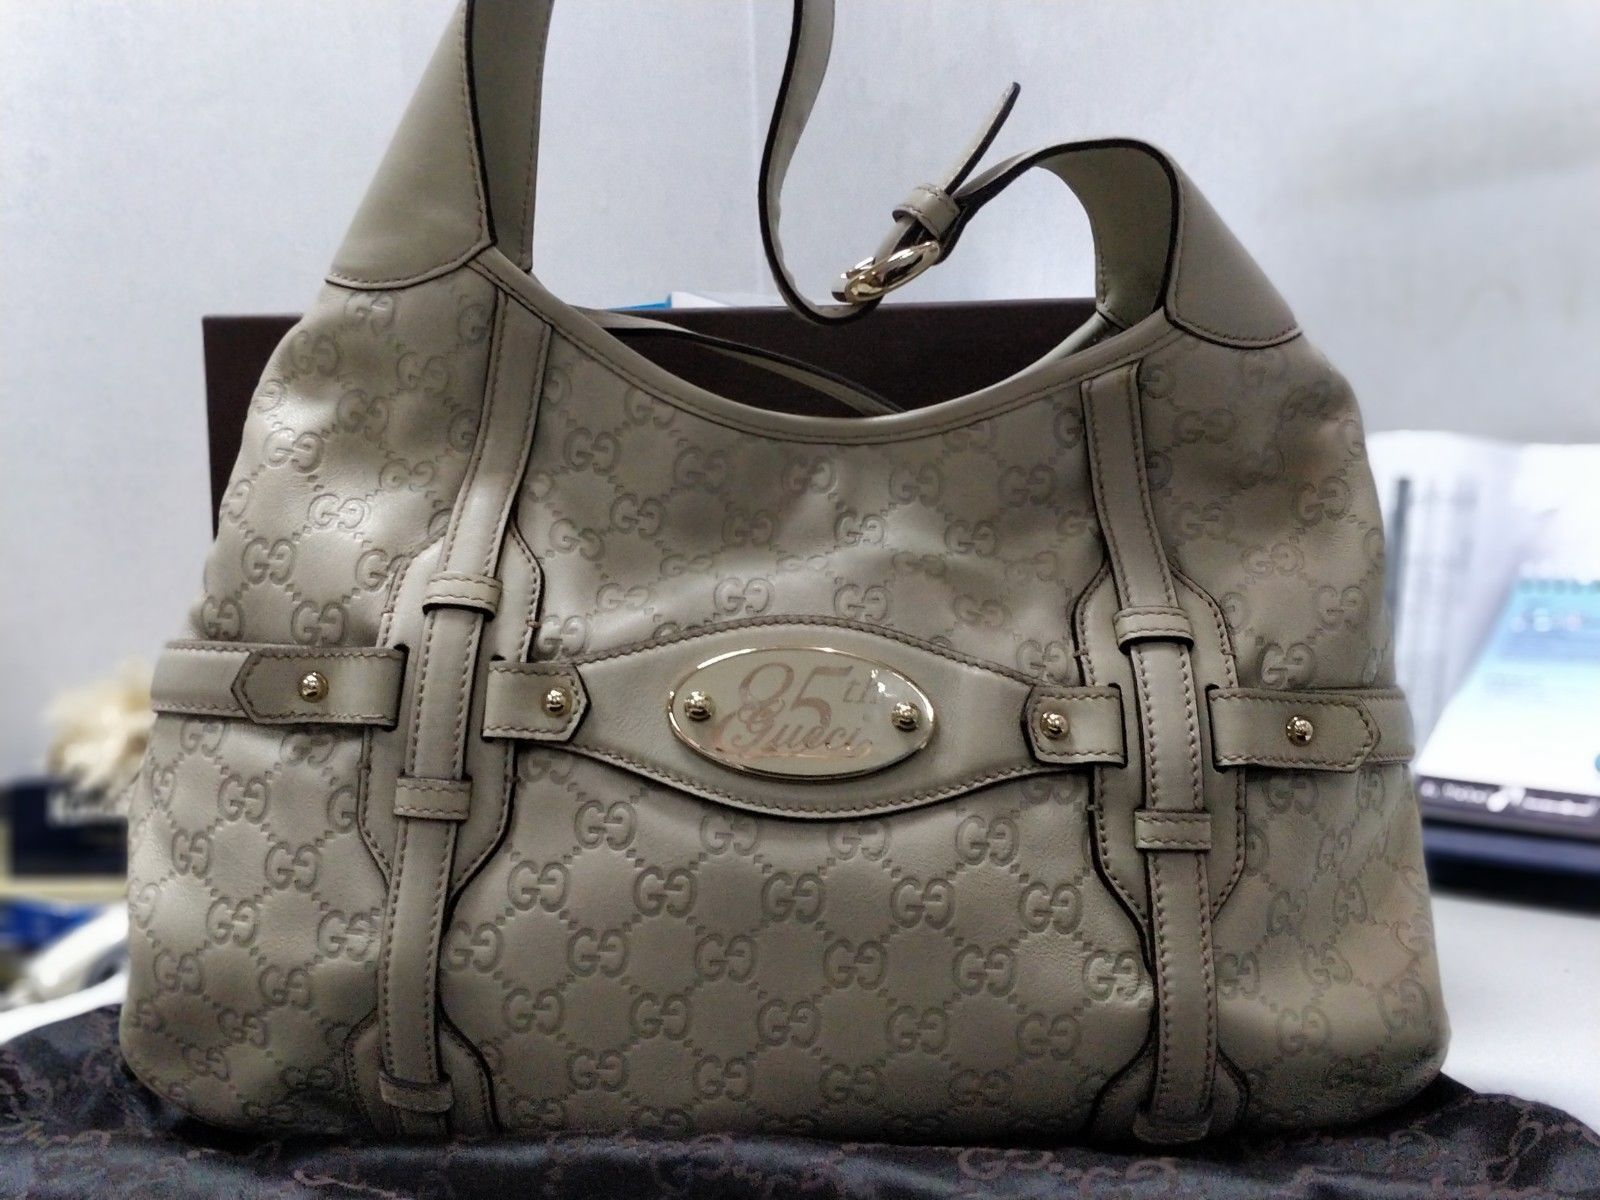 9046e4574 Auth Gucci Limited Edition 85th Anniversary White Leather Bridal Brit Hobo  Bag